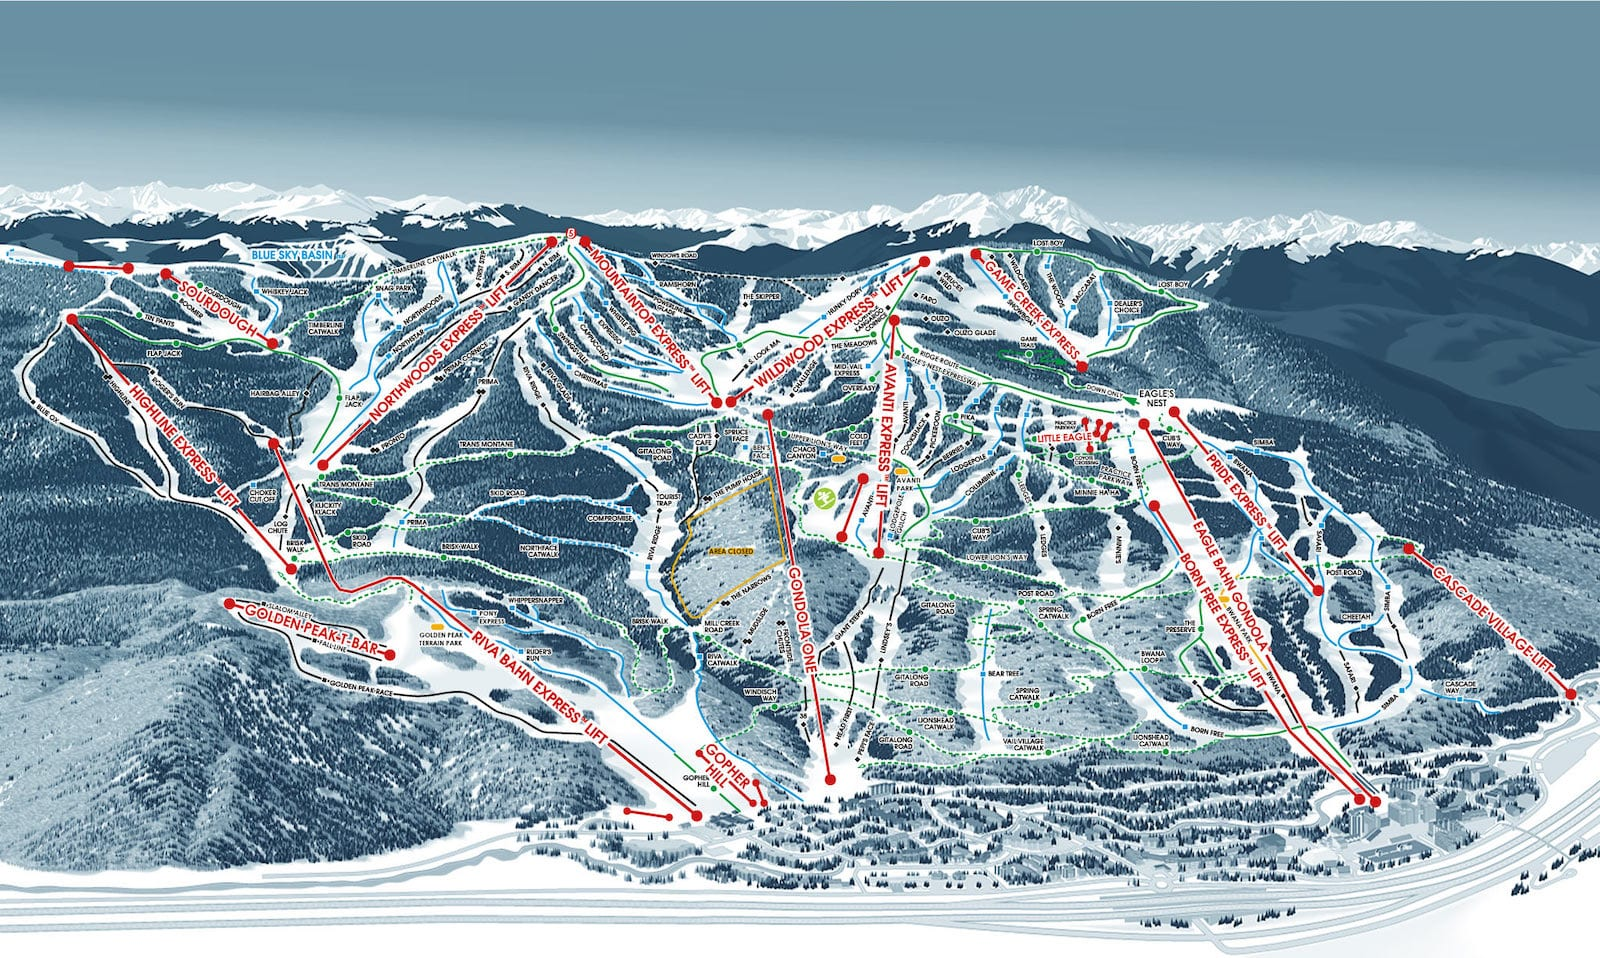 Vail Ski Resort Trail Map Front Side